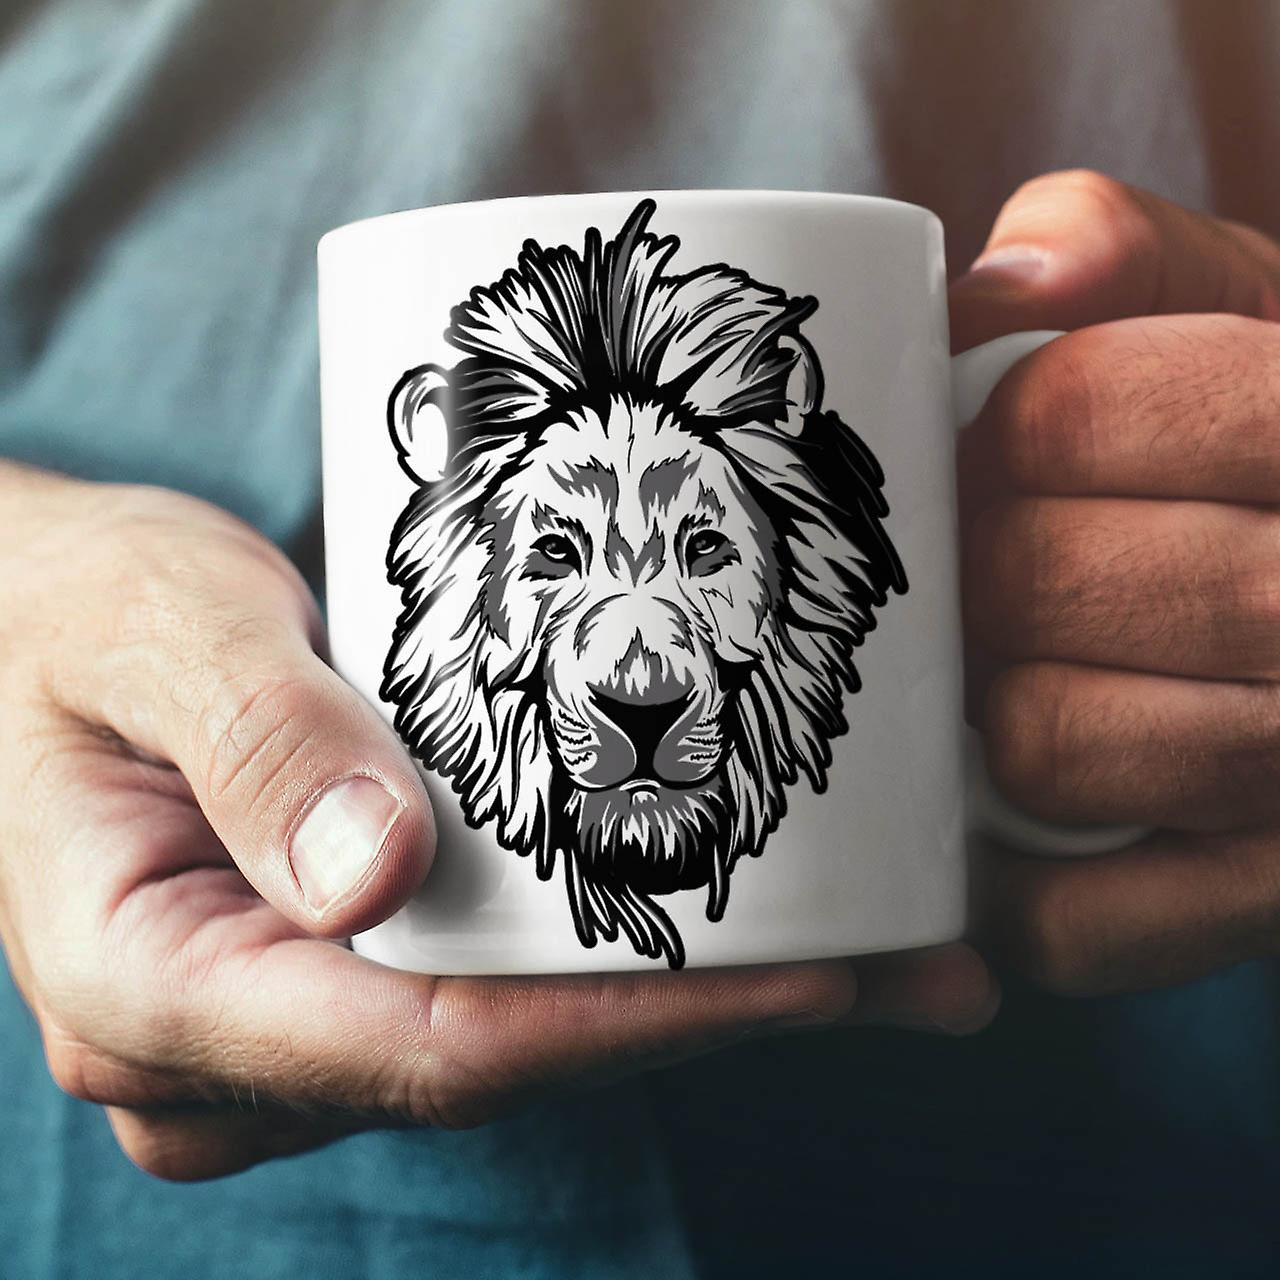 Lion Beast Calm Animal NEW White Tea Coffee Ceramic Mug 11 oz | Wellcoda